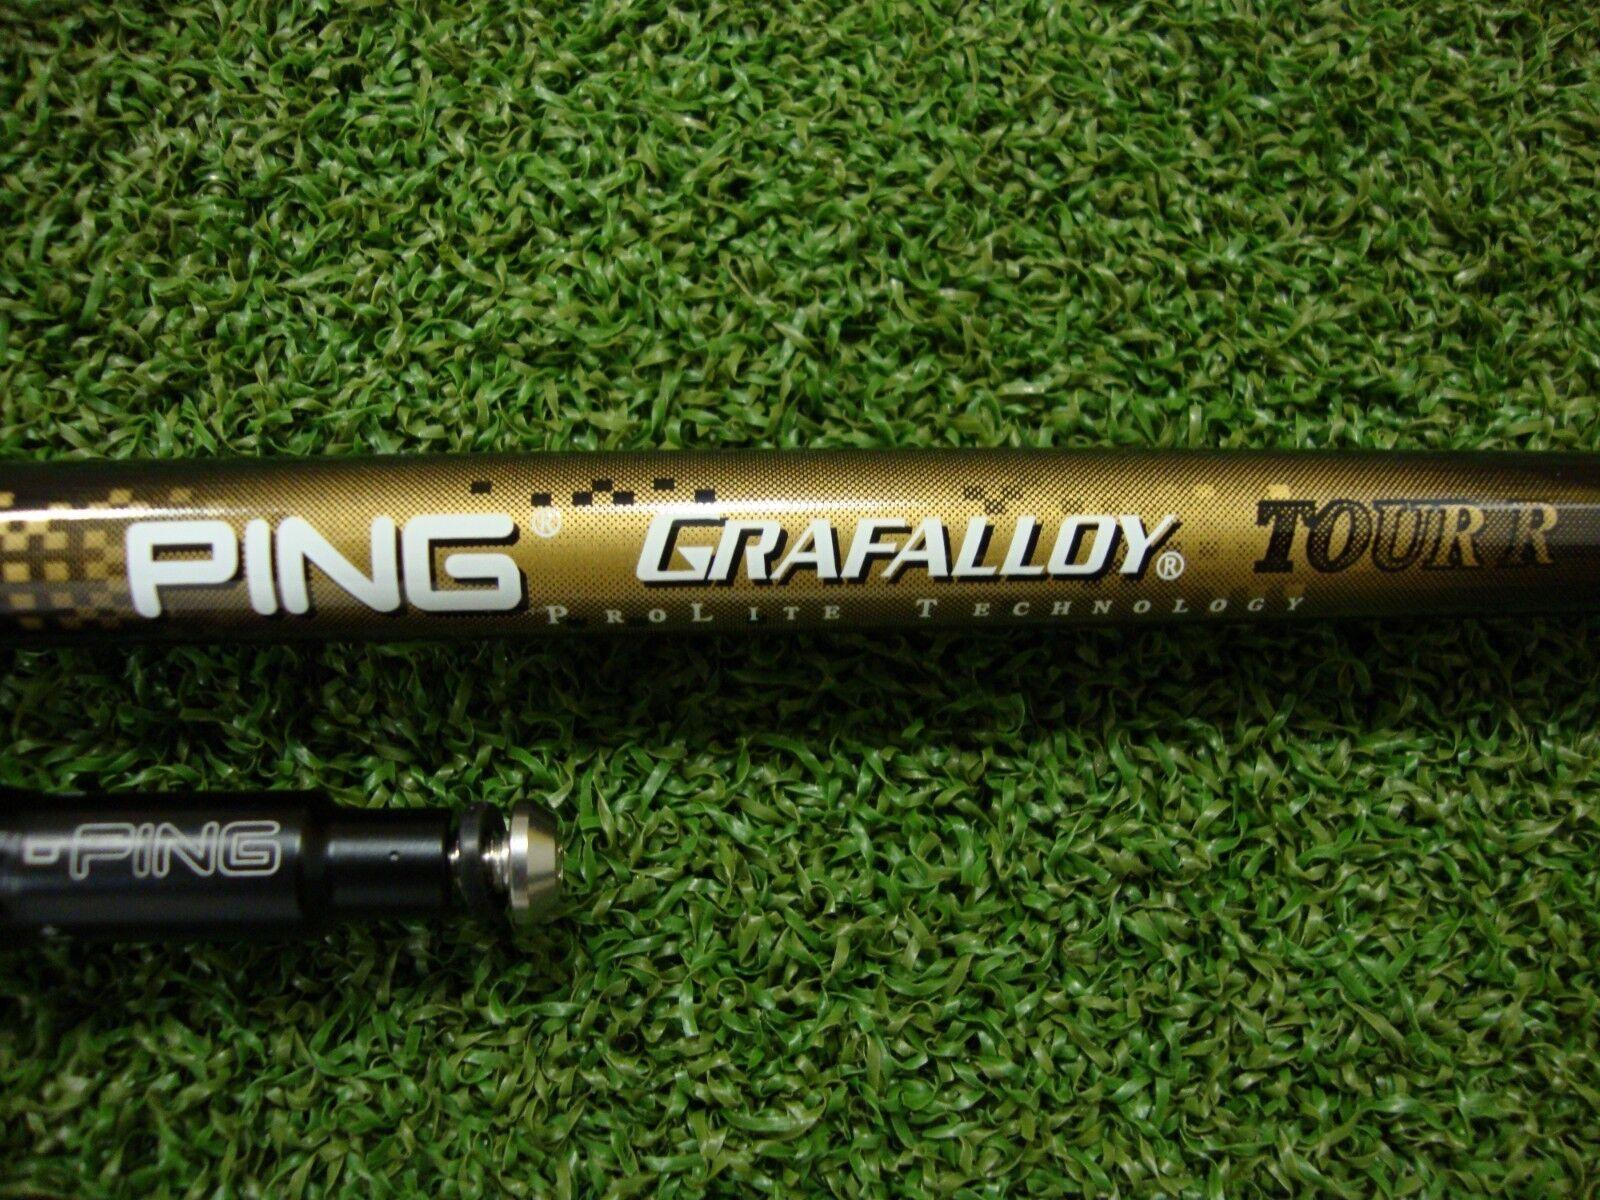 Ping G410 Adaptador &  Controlador De Grafito Eje Grafalloy Prolite regular  tienda de venta